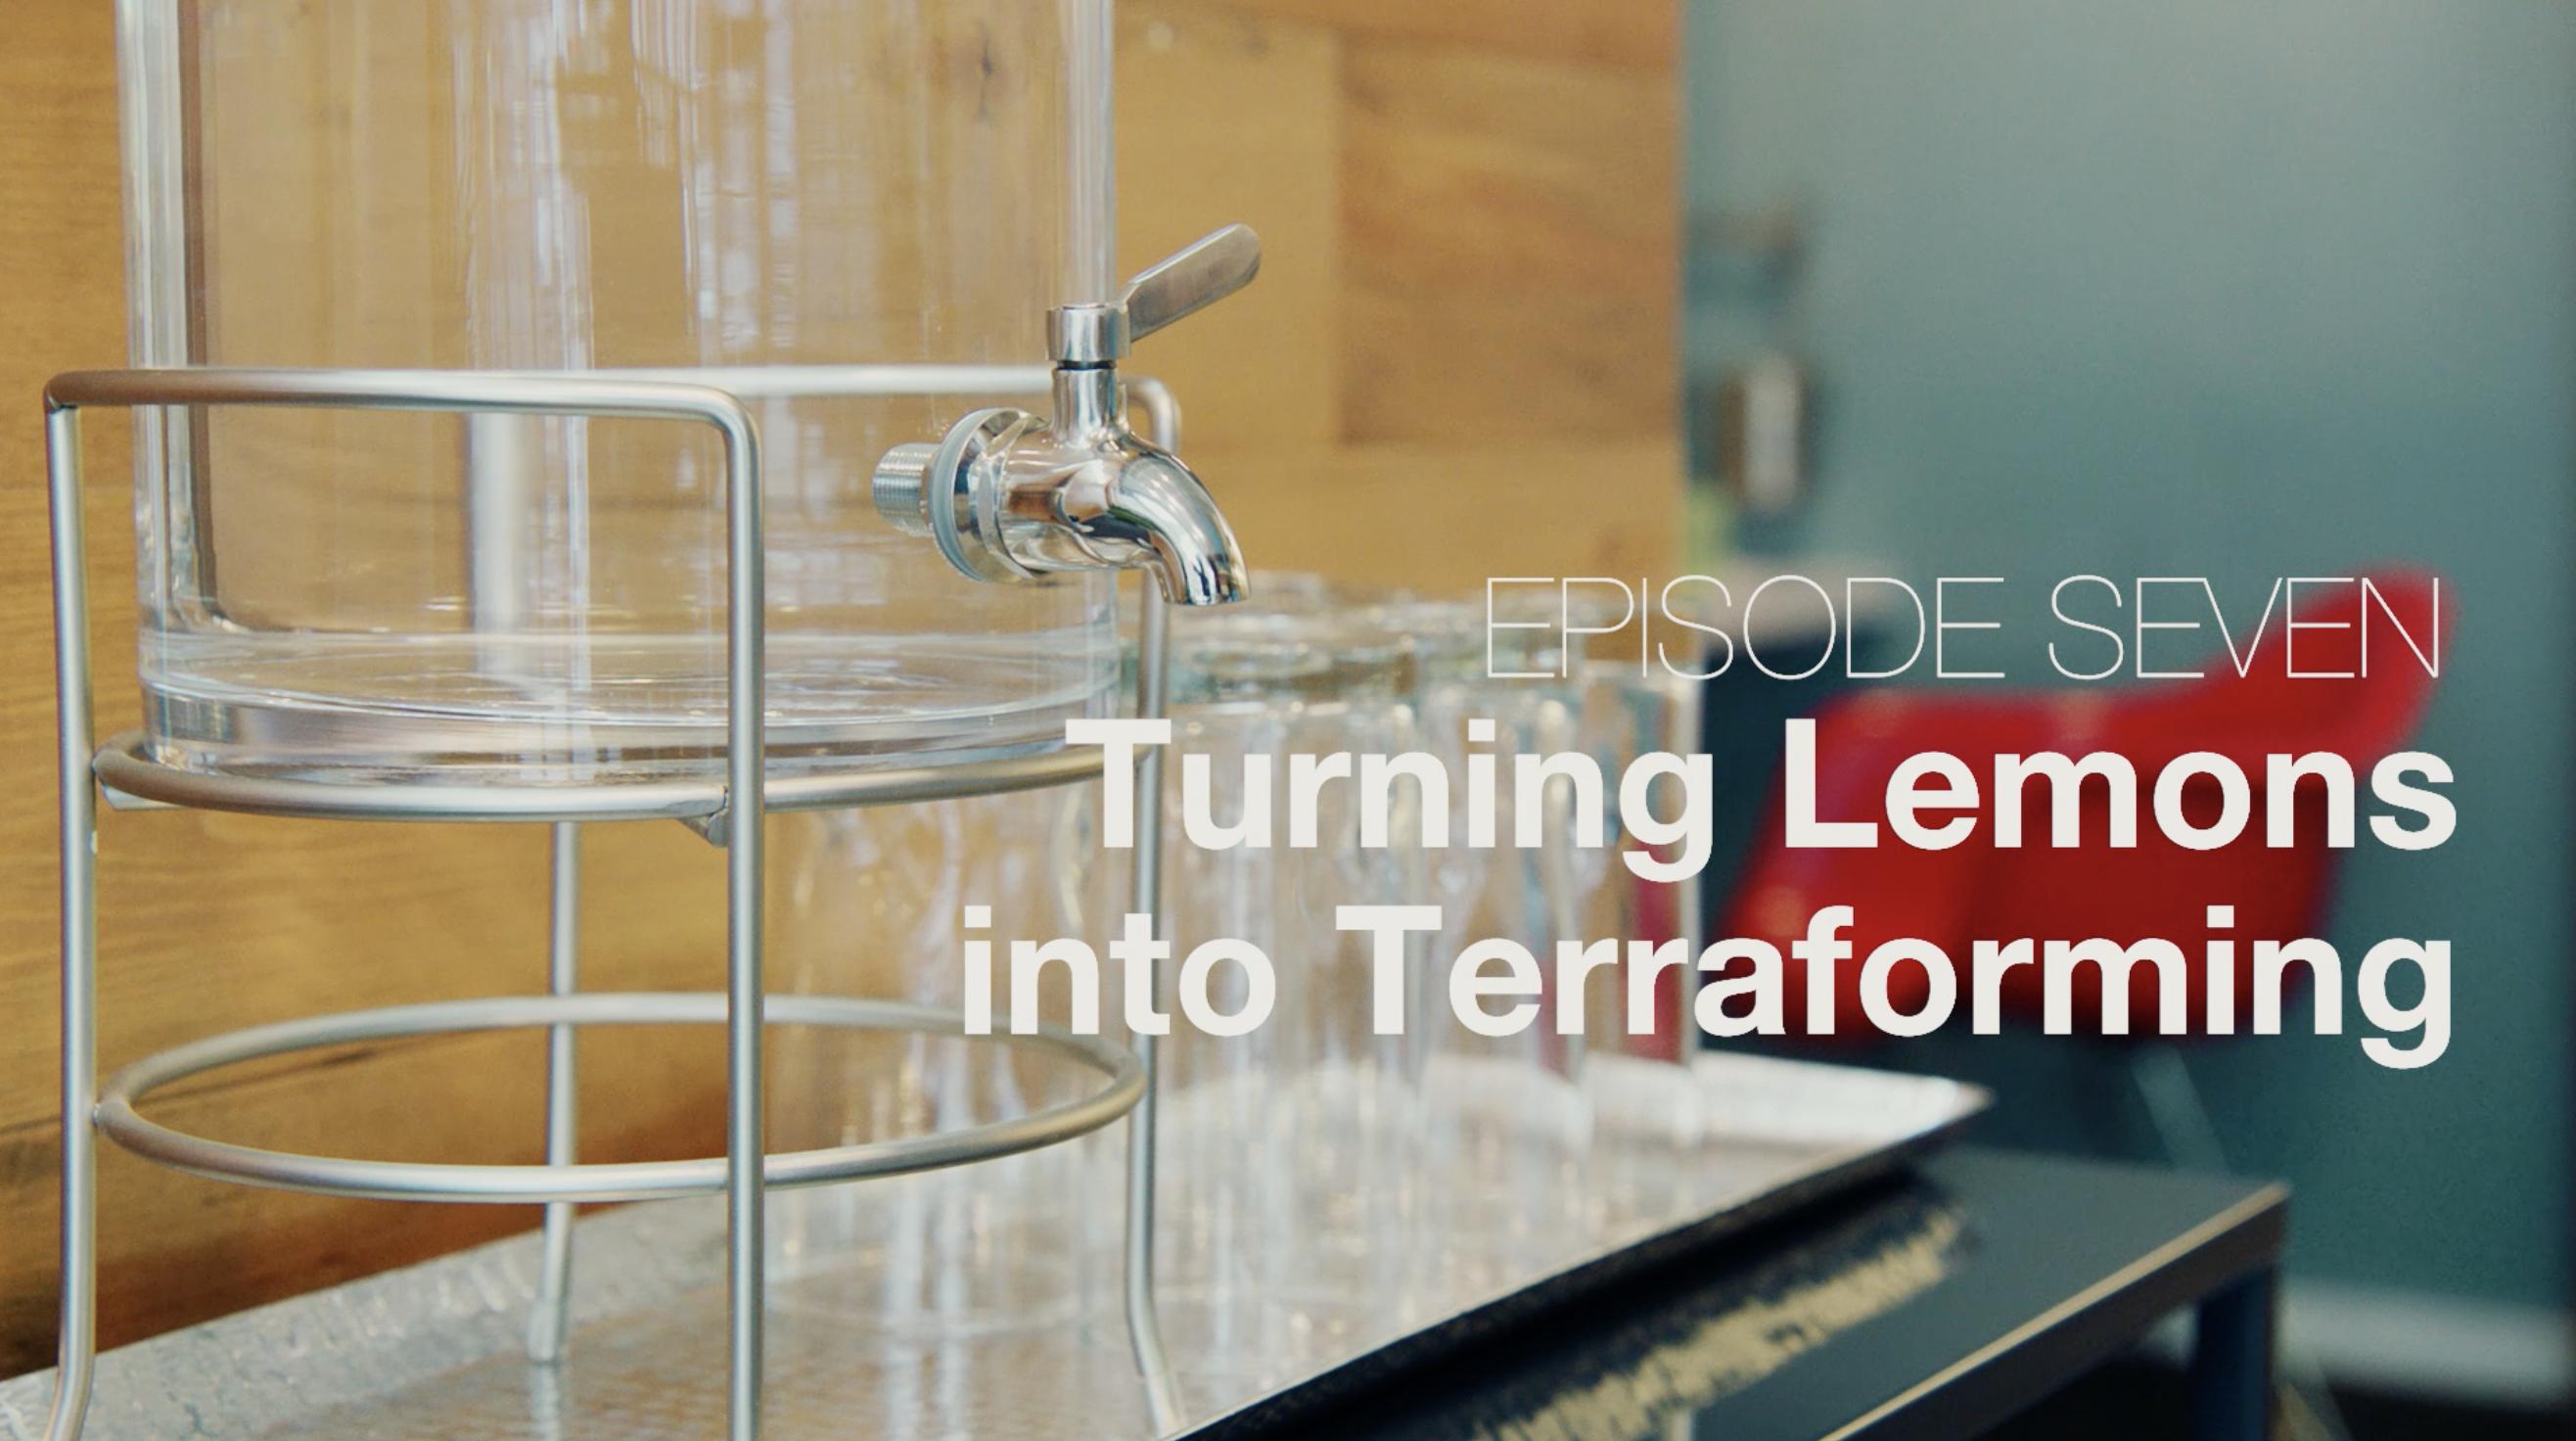 Ep 07 - Turning Lemons into Terraforming   Bubbleproof